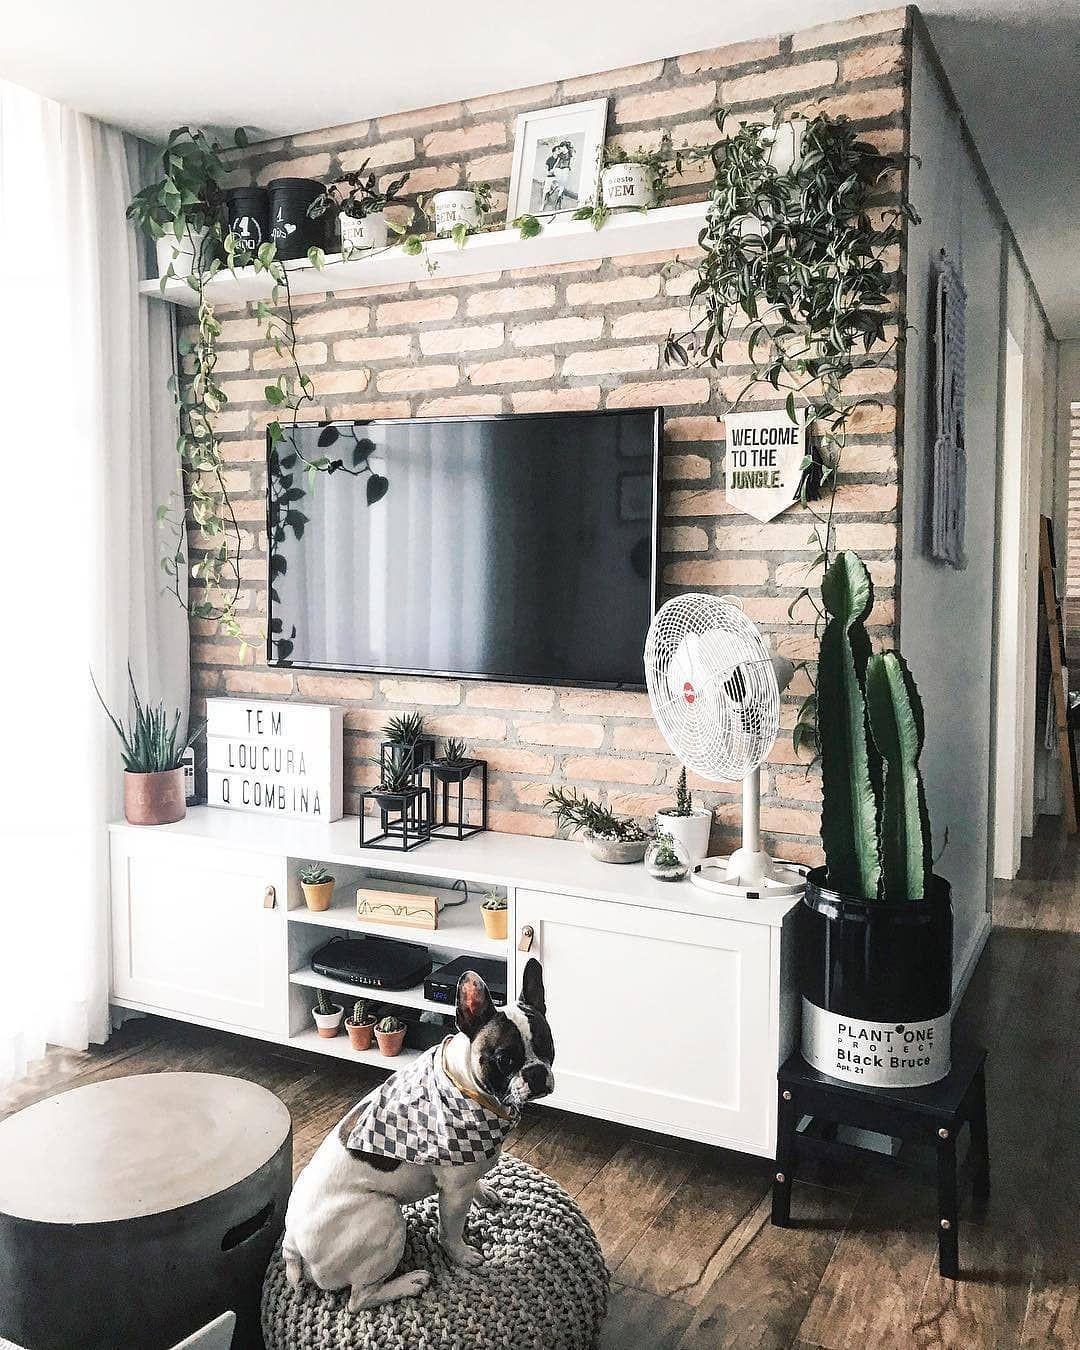 دکور تلویزیون با گل و گیاه